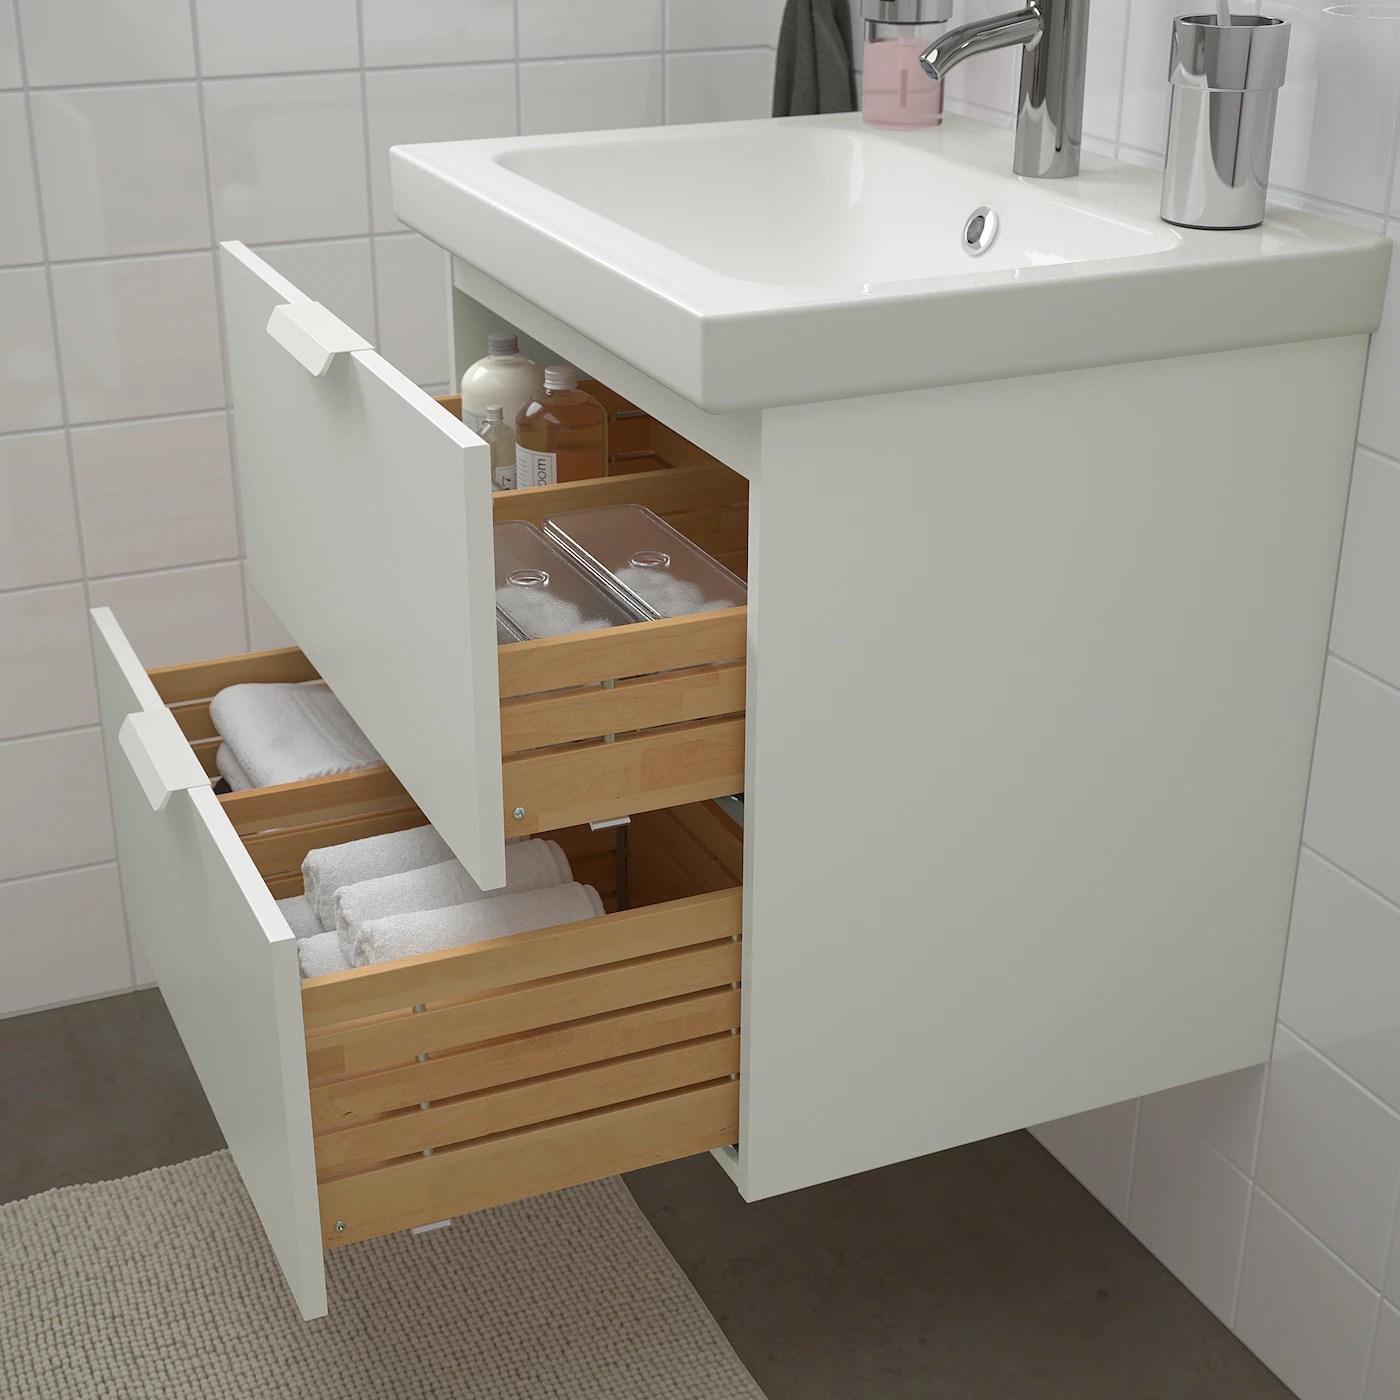 Godmorgon Odensvik Badrumsmobler 4 Delar Vit Dalskar Kran Bredd 63 Cm Ikea